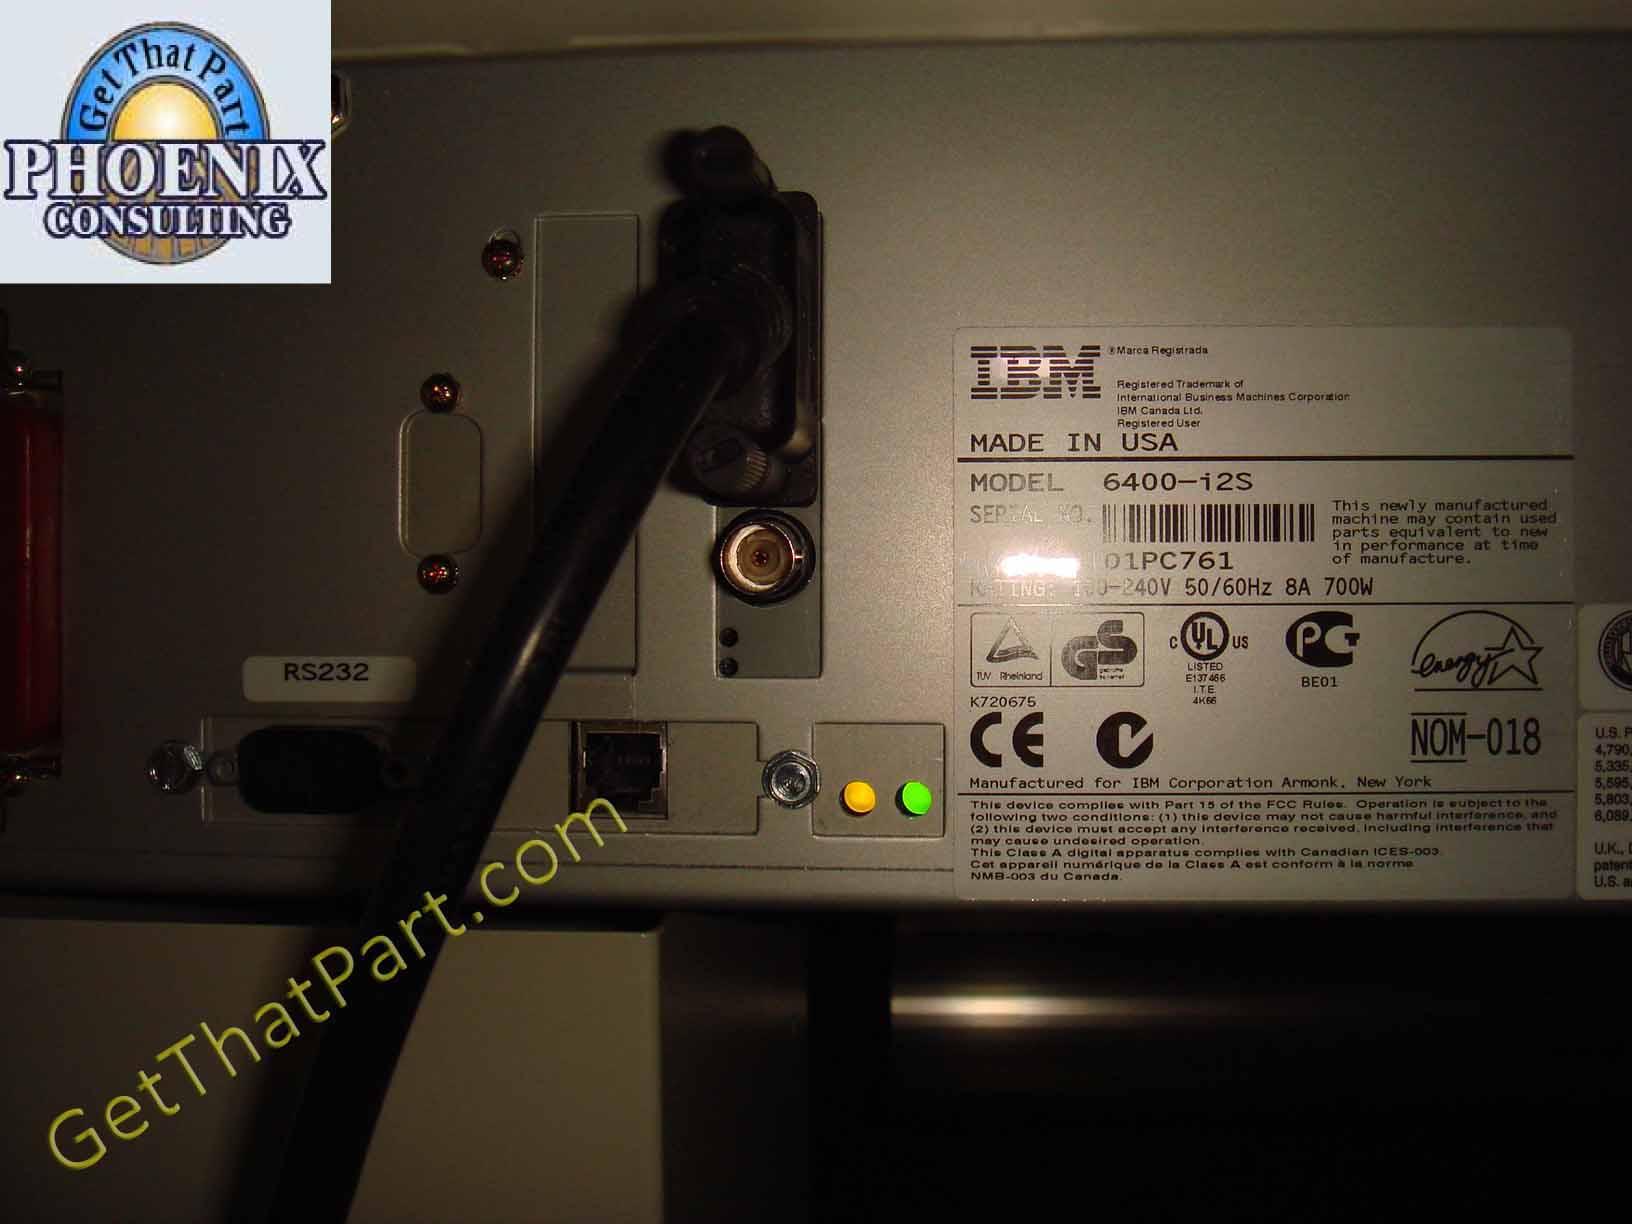 ibm 6400 i2s 6400i2s 2000 lpm line matrix network workgroup printer rh getthatpart com